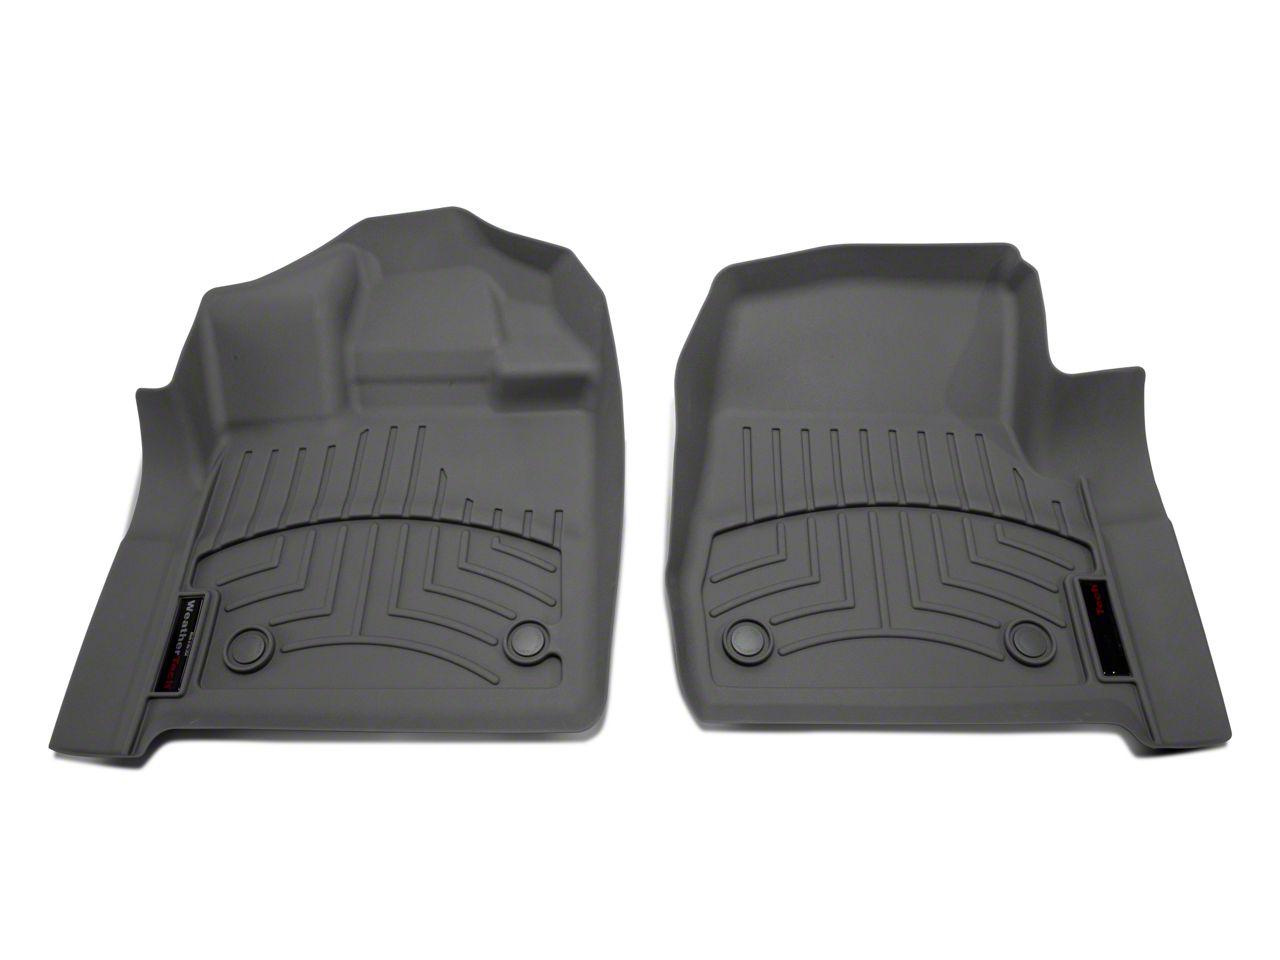 Weathertech DigitalFit Front Floor Liners - Gray (15-19 F-150 Regular Cab)